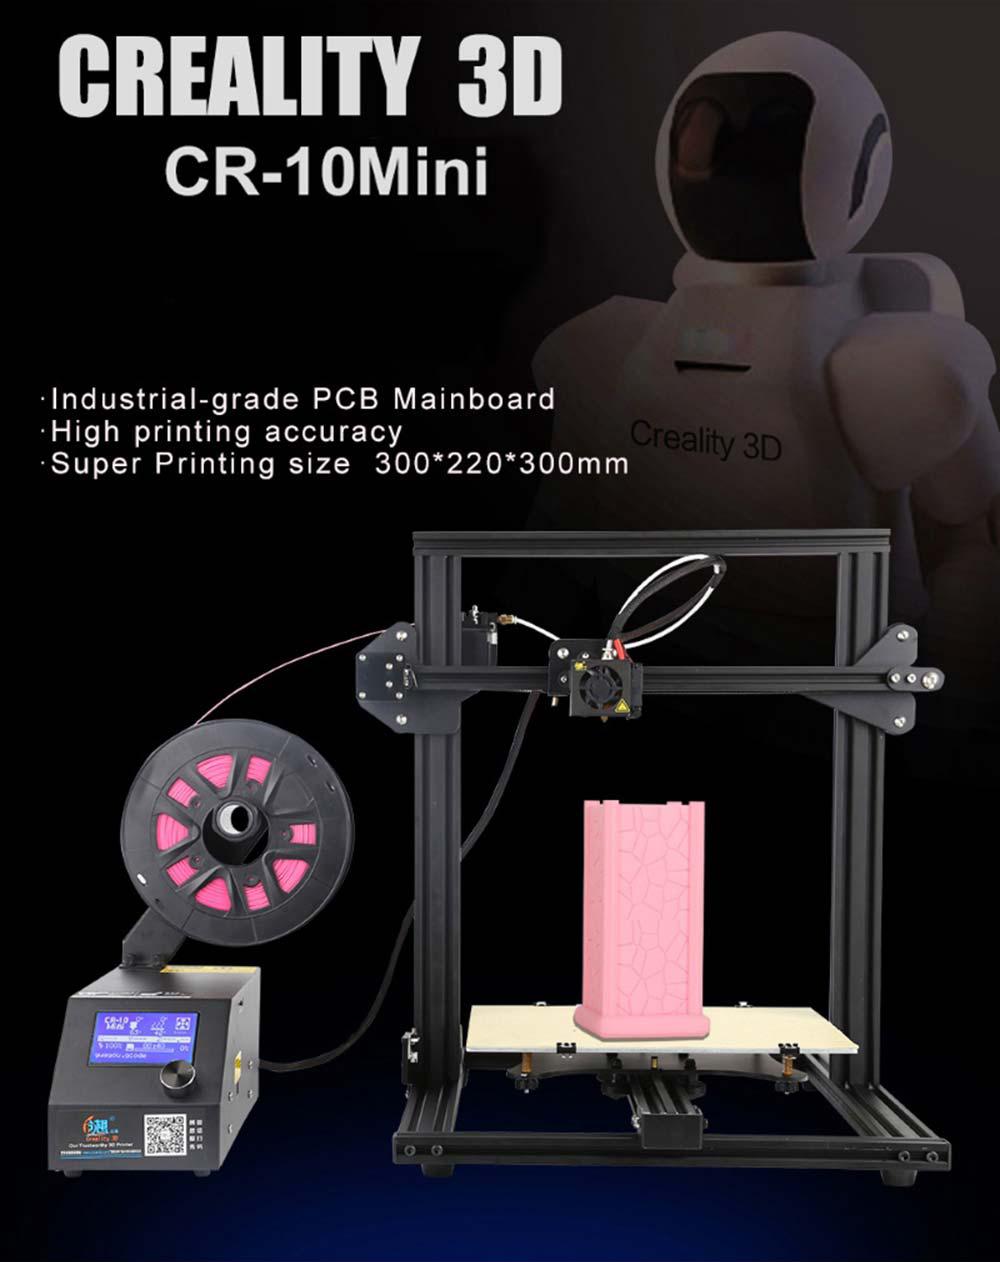 Creality3D CR-10 Mini 3D-Drucker Bausatz - 300x220x300mm - Produktvorstellung